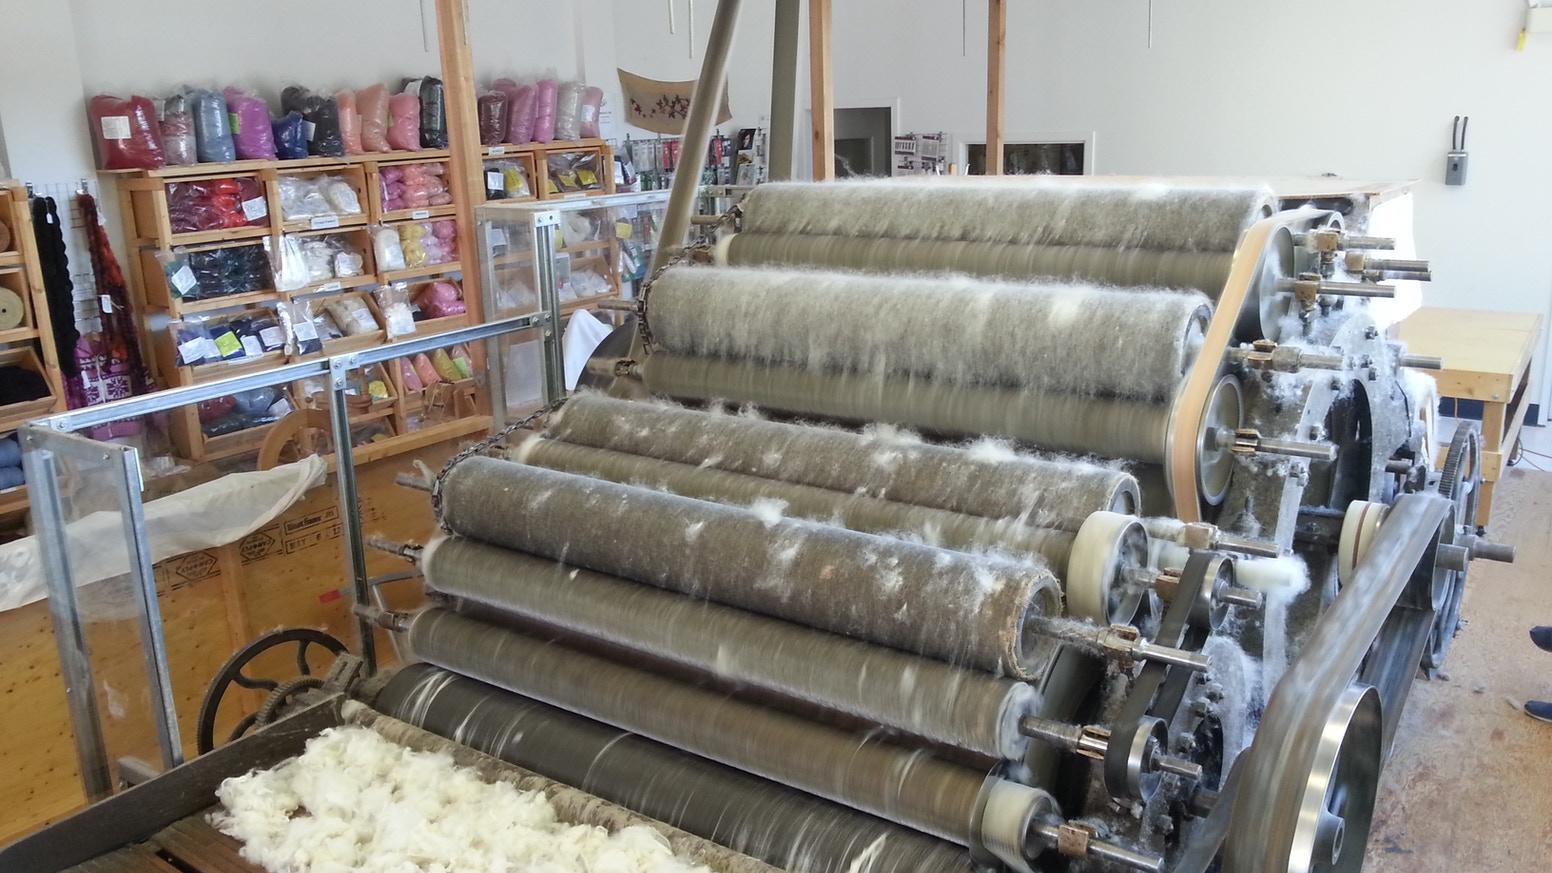 yun tarak makinesi